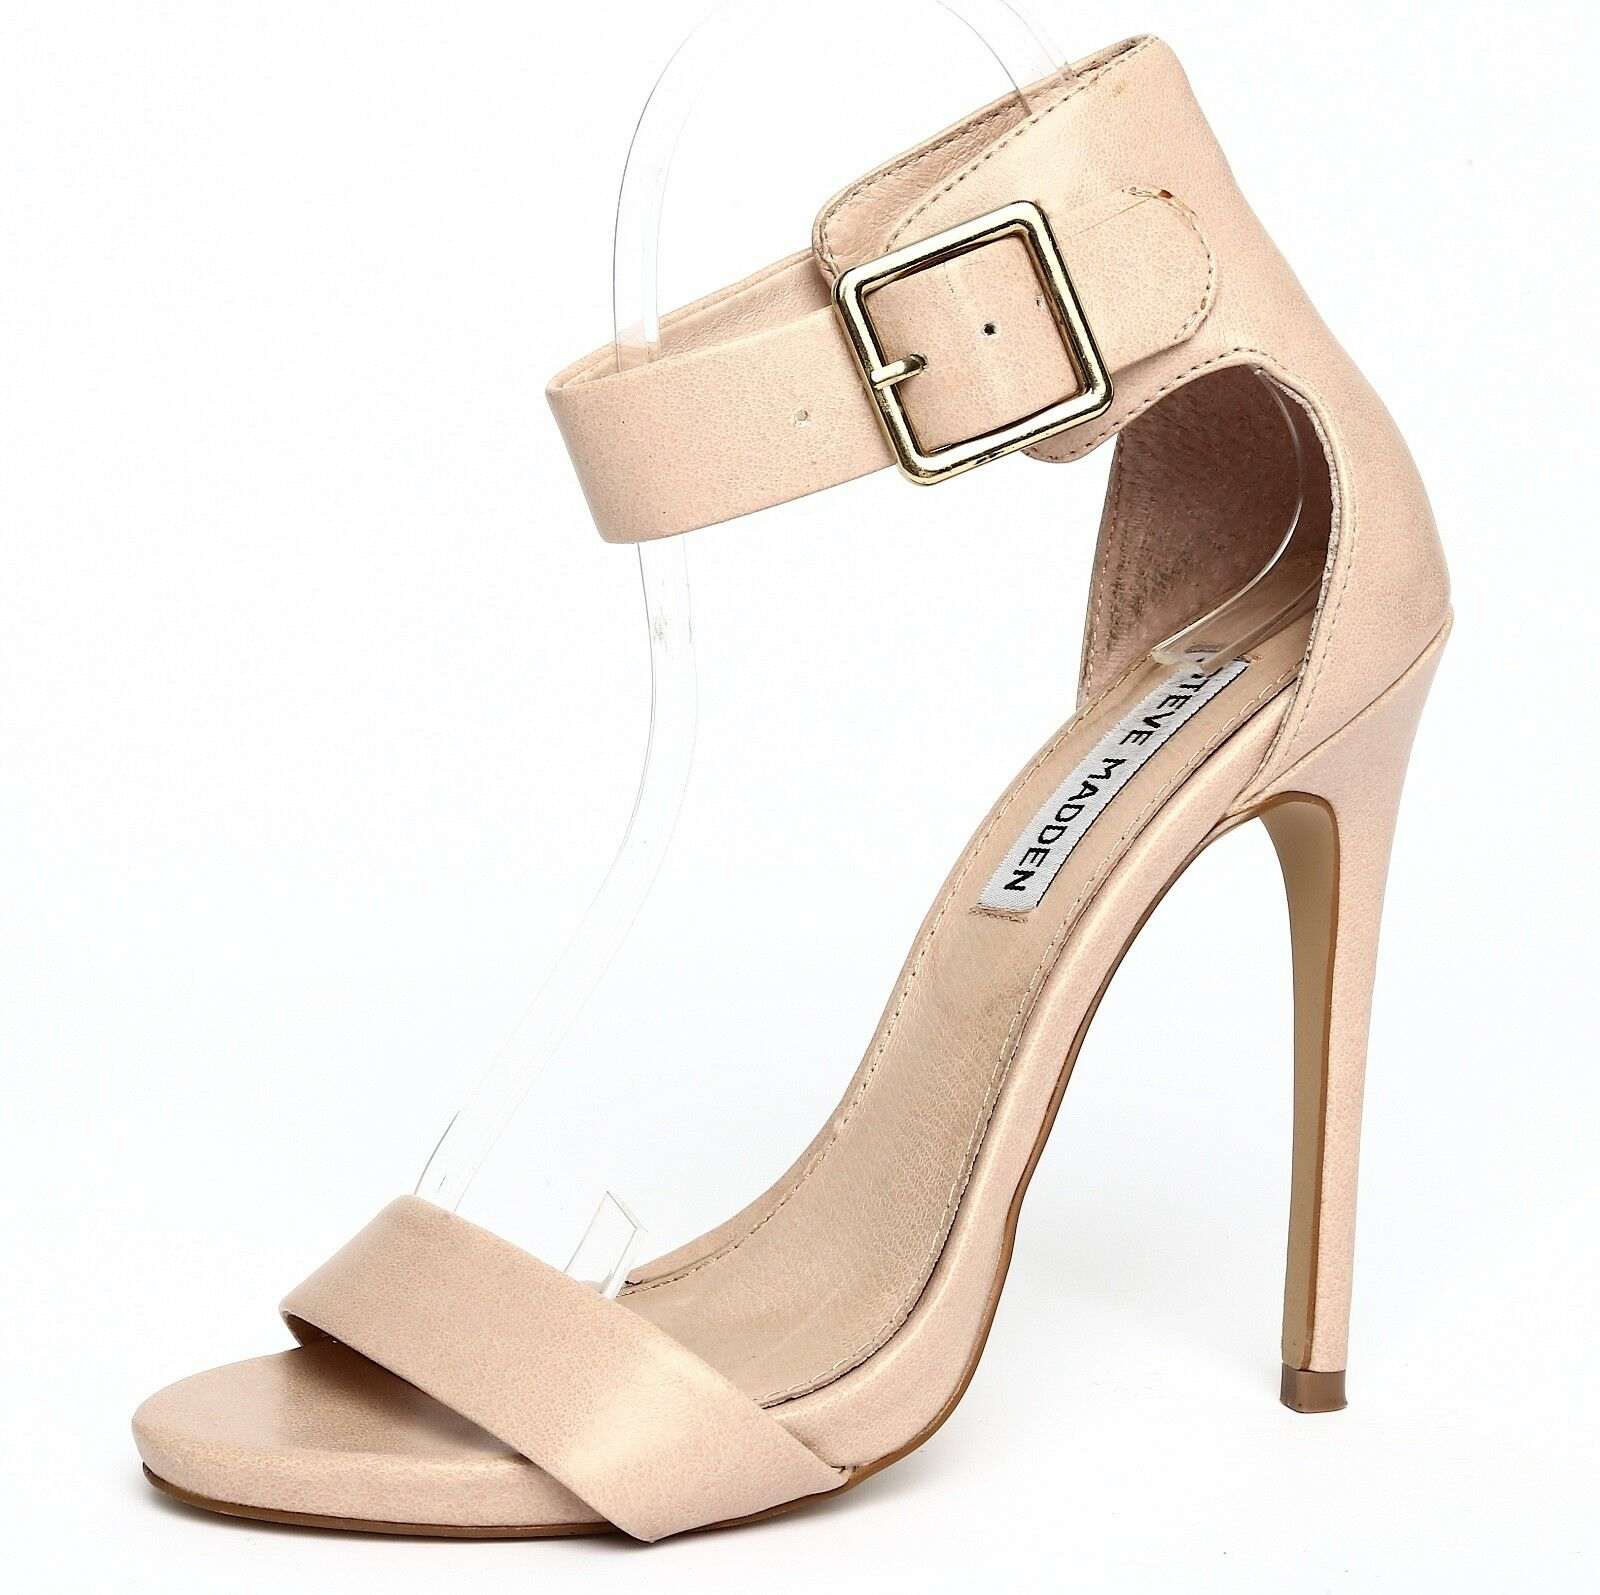 Steve Madden Marlenee Nude Ankle Strap Sandal Heels Sz 6.5M 3491